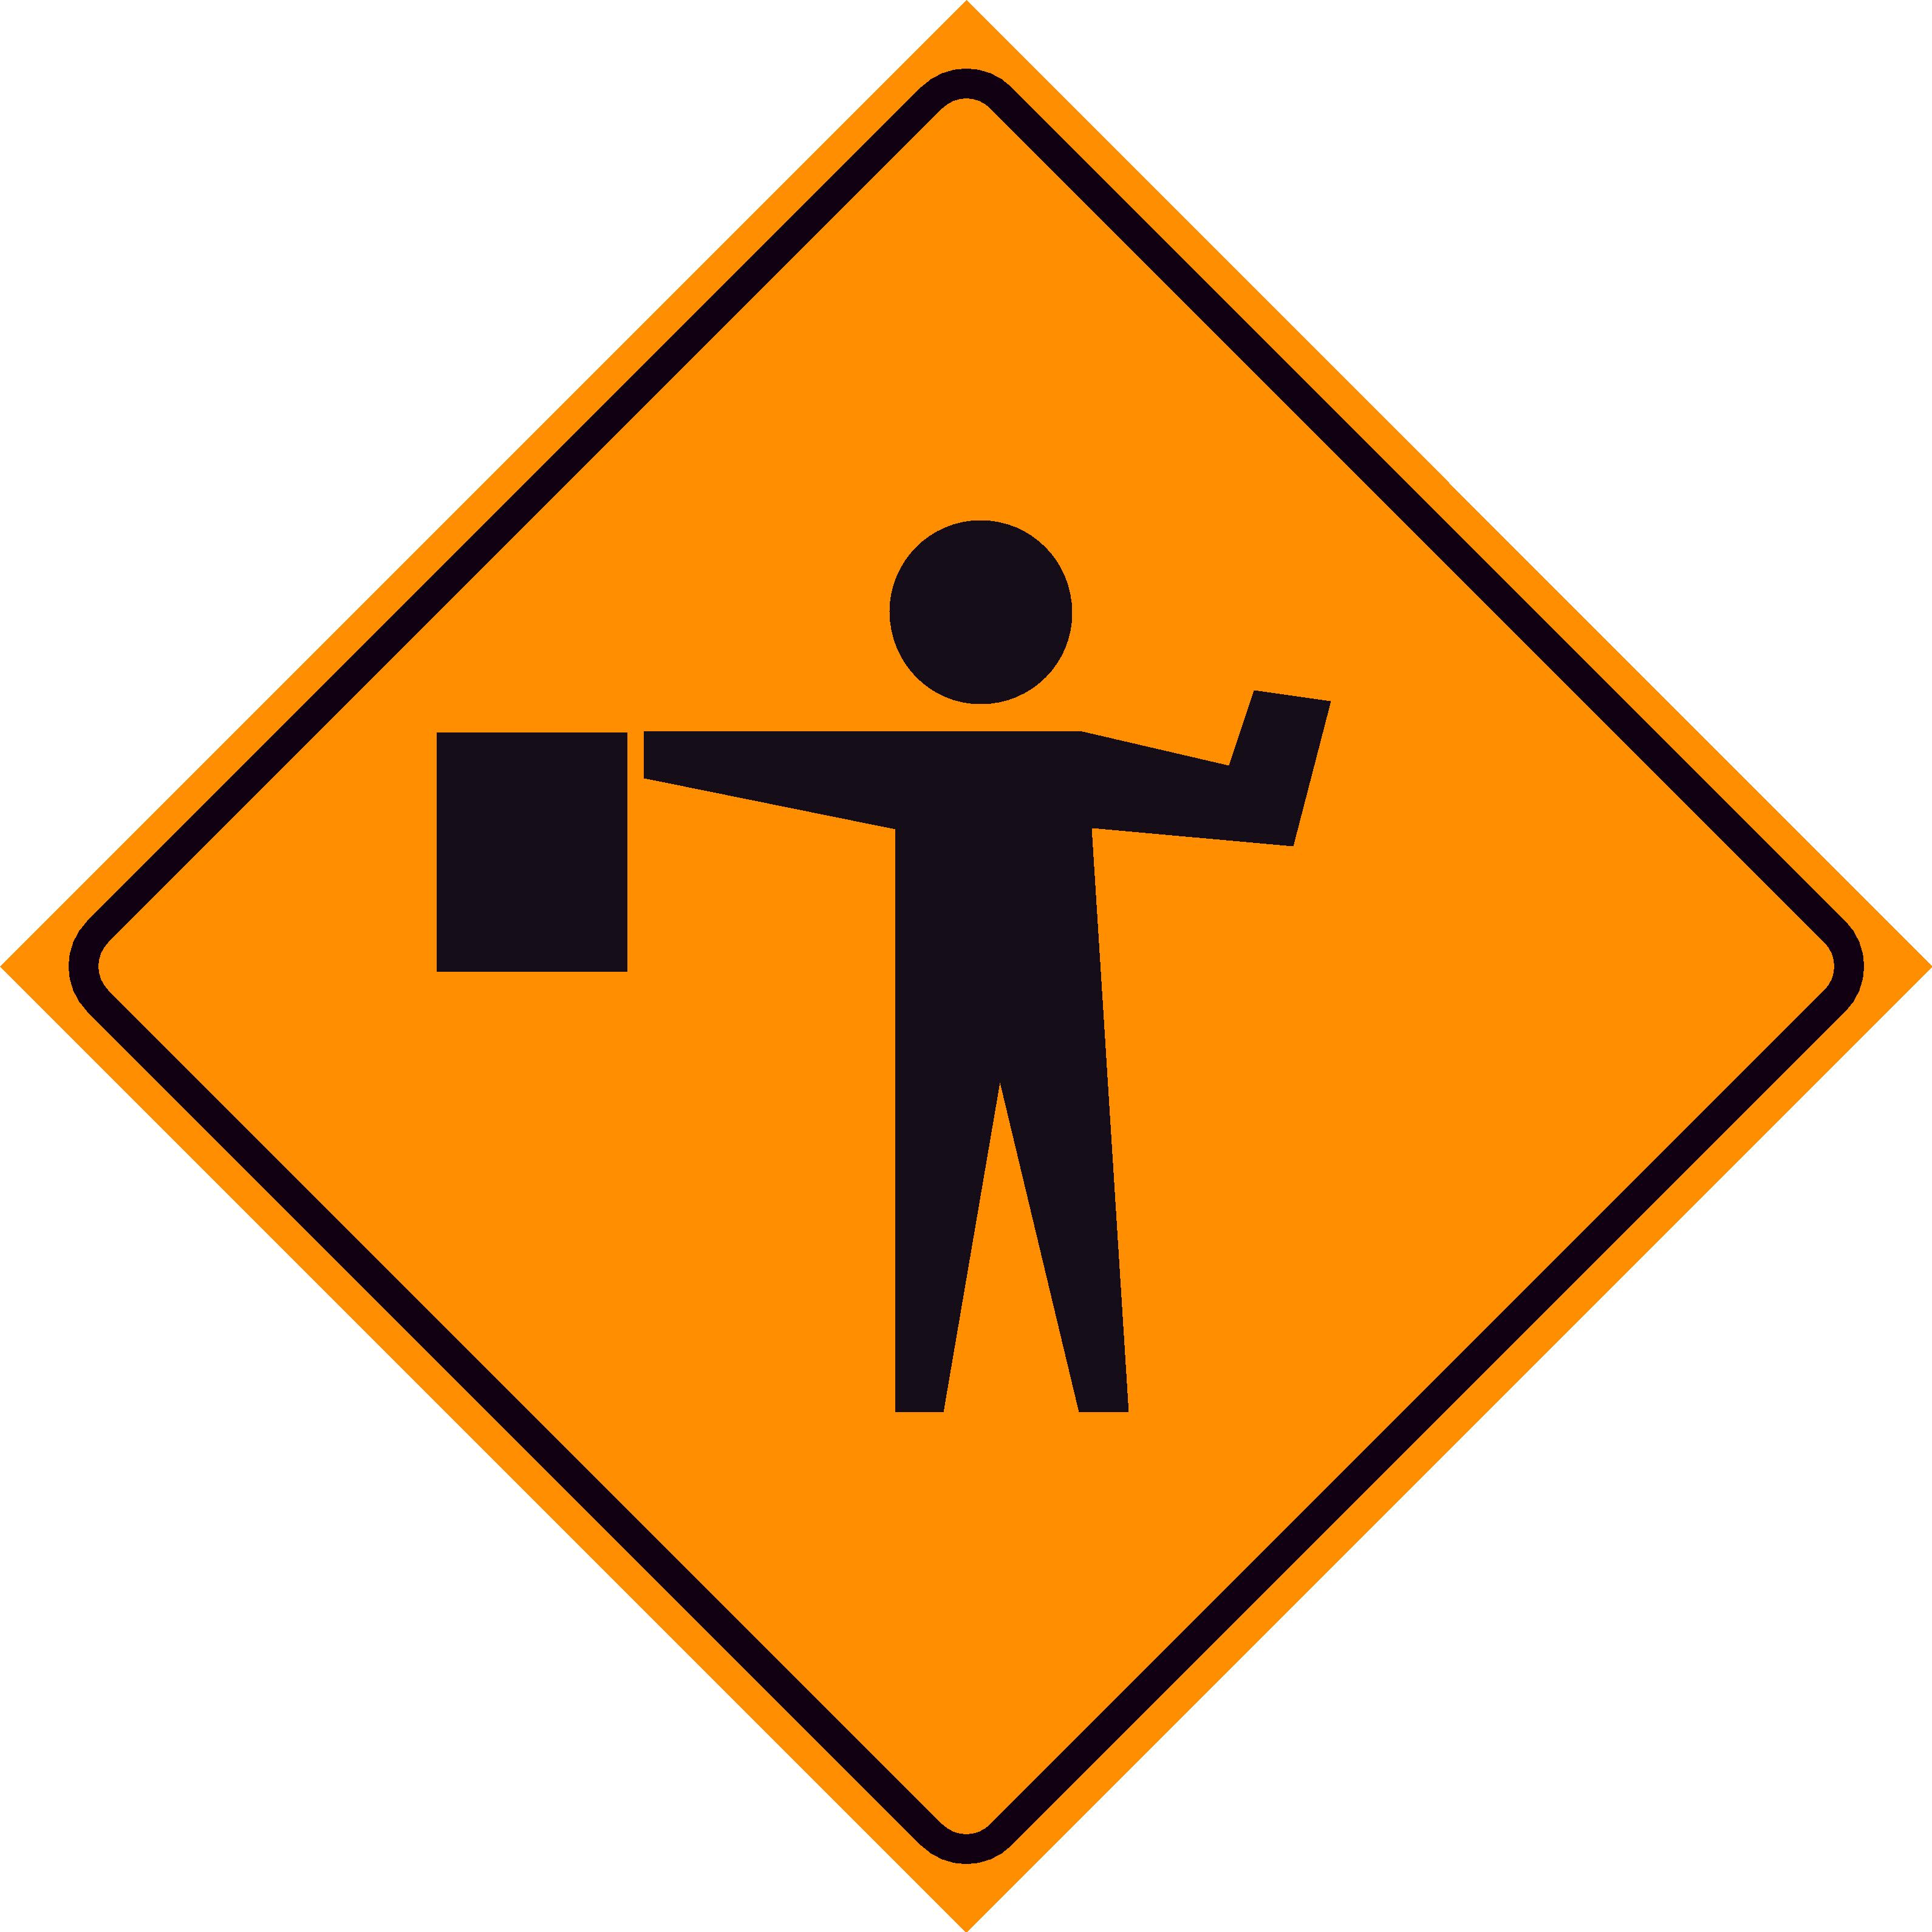 Clipart road signs bridge work.